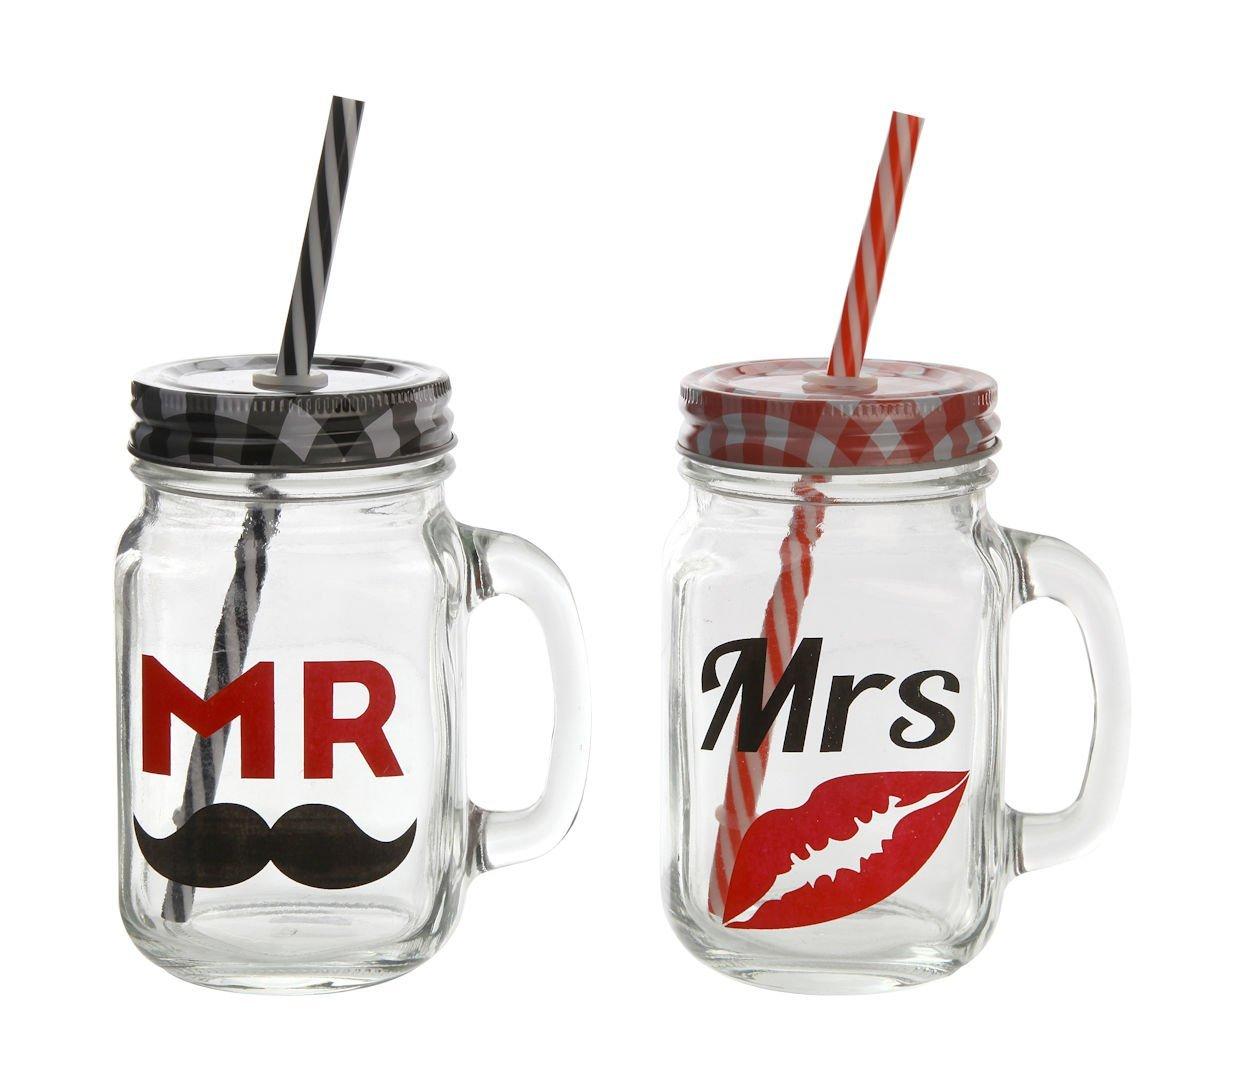 """Mr. & Mrs."" Trinkgläser mit Halm 2er Set"